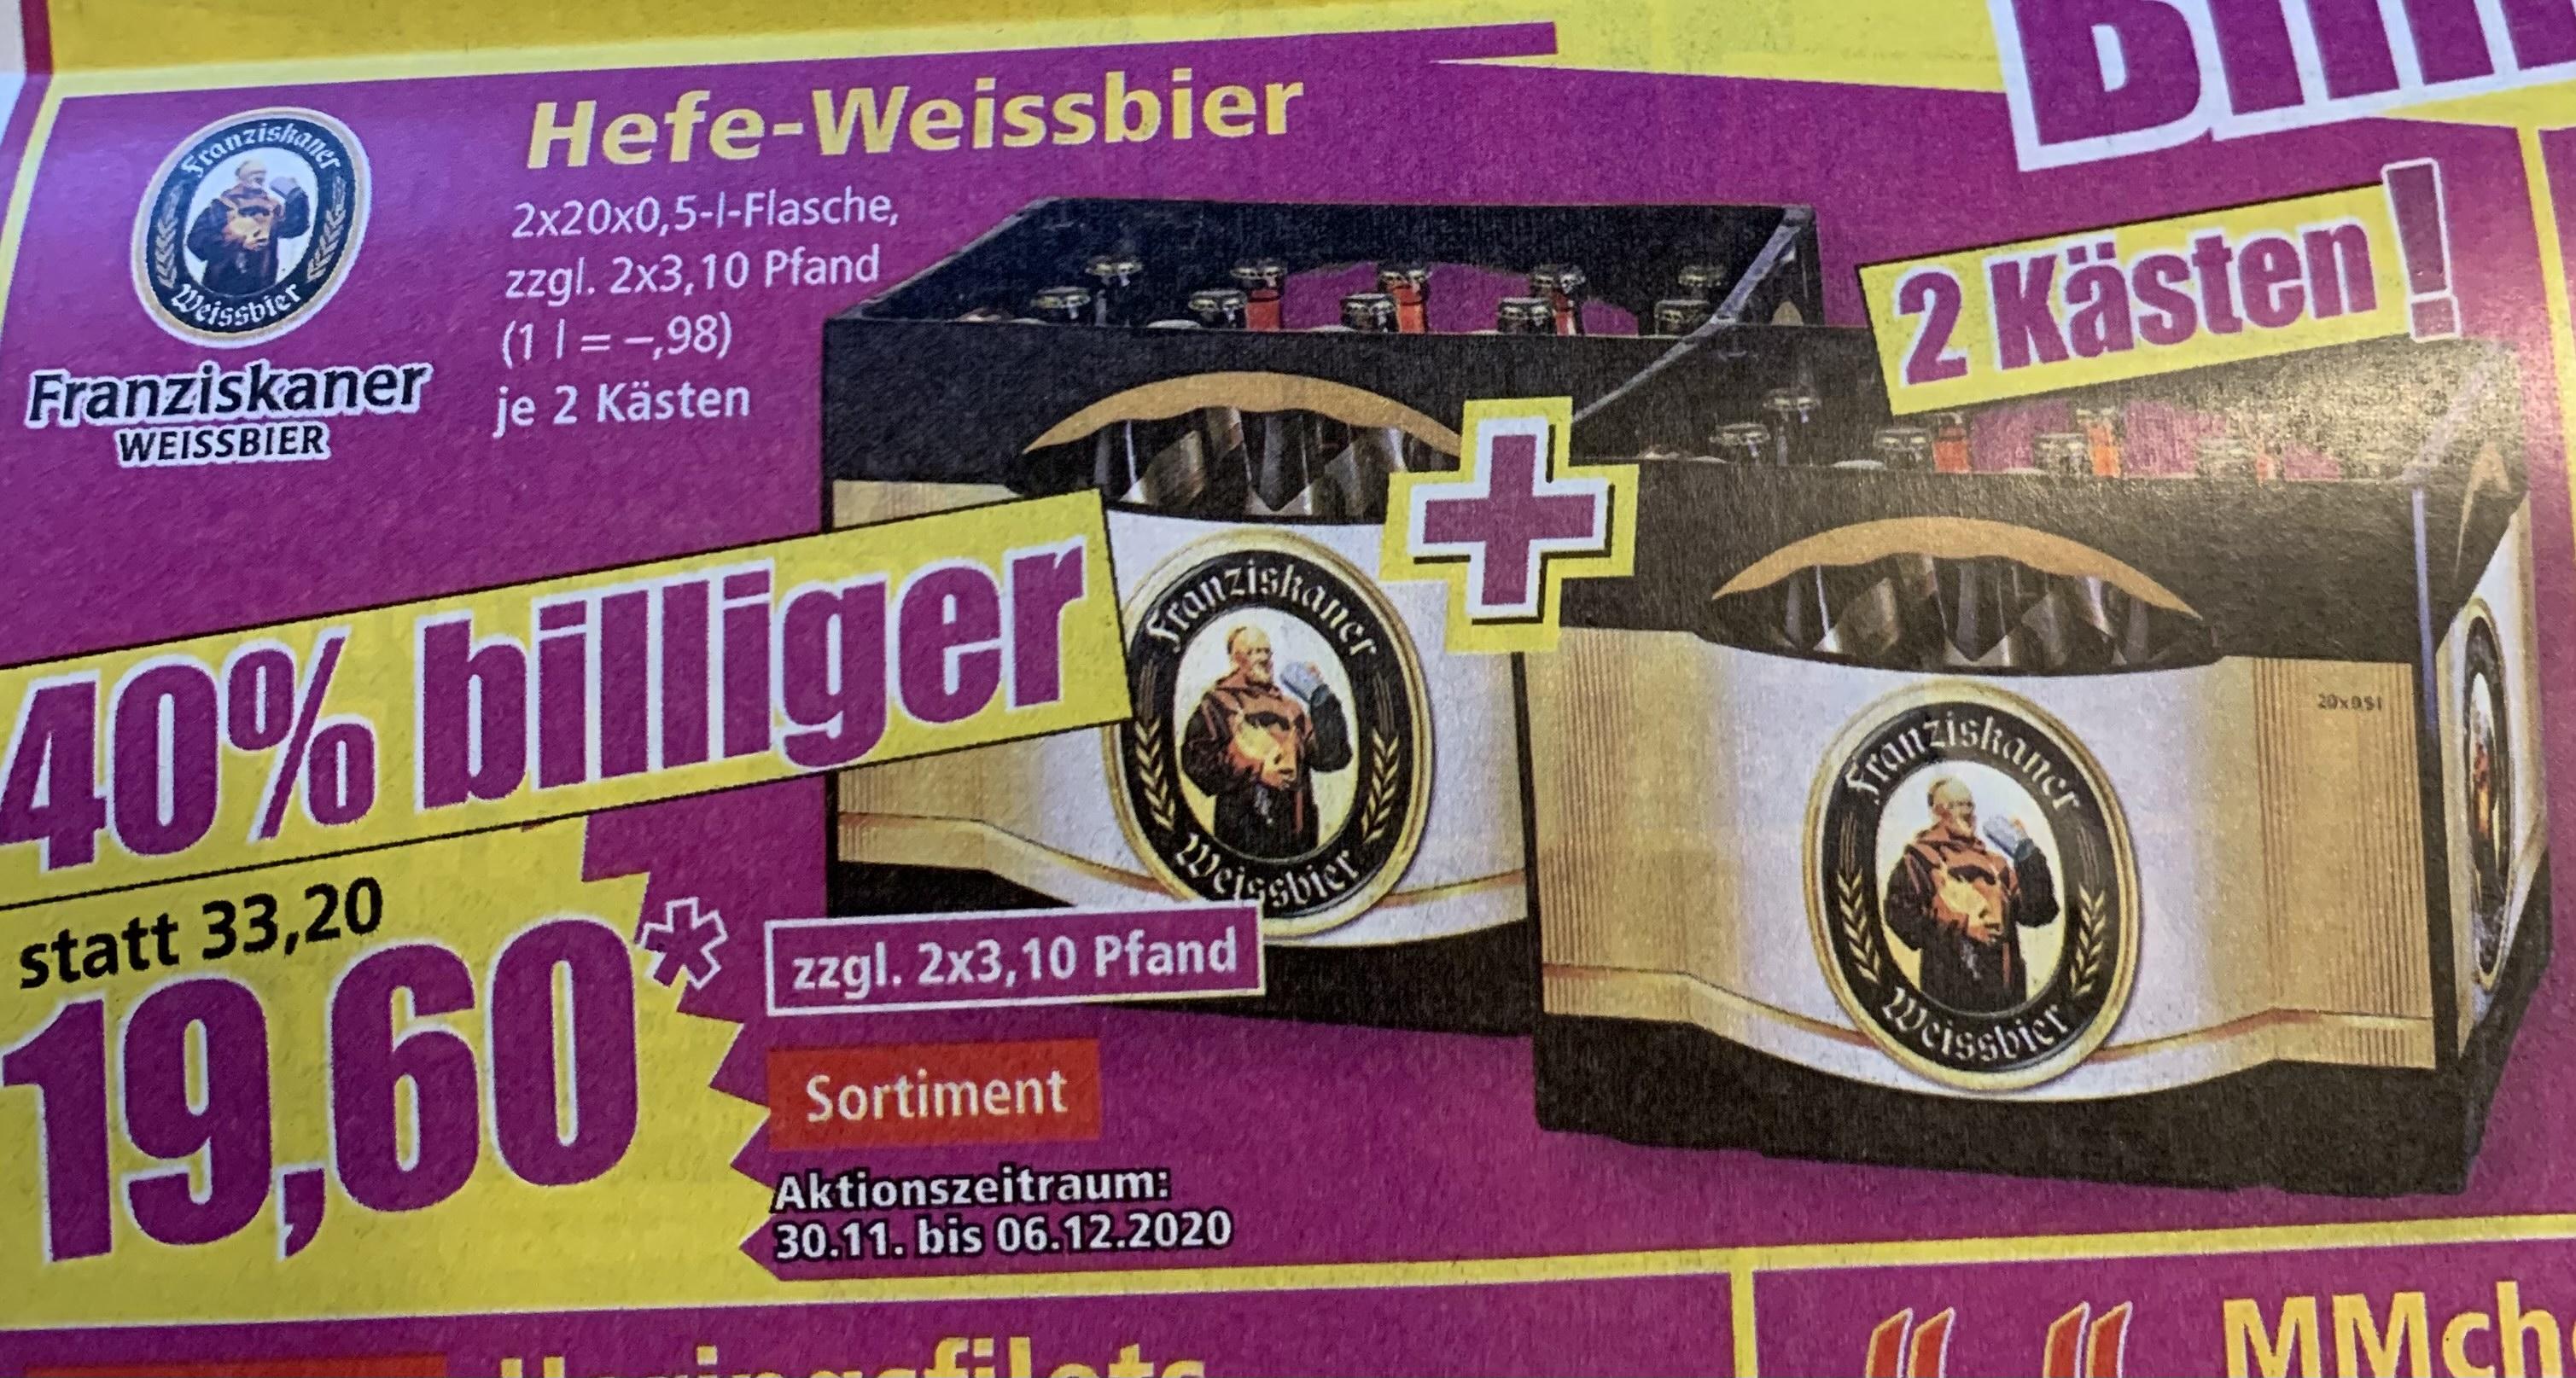 [Norma] Franziskaner Hefe-Weißbier 2 Kästen nur 19,60€